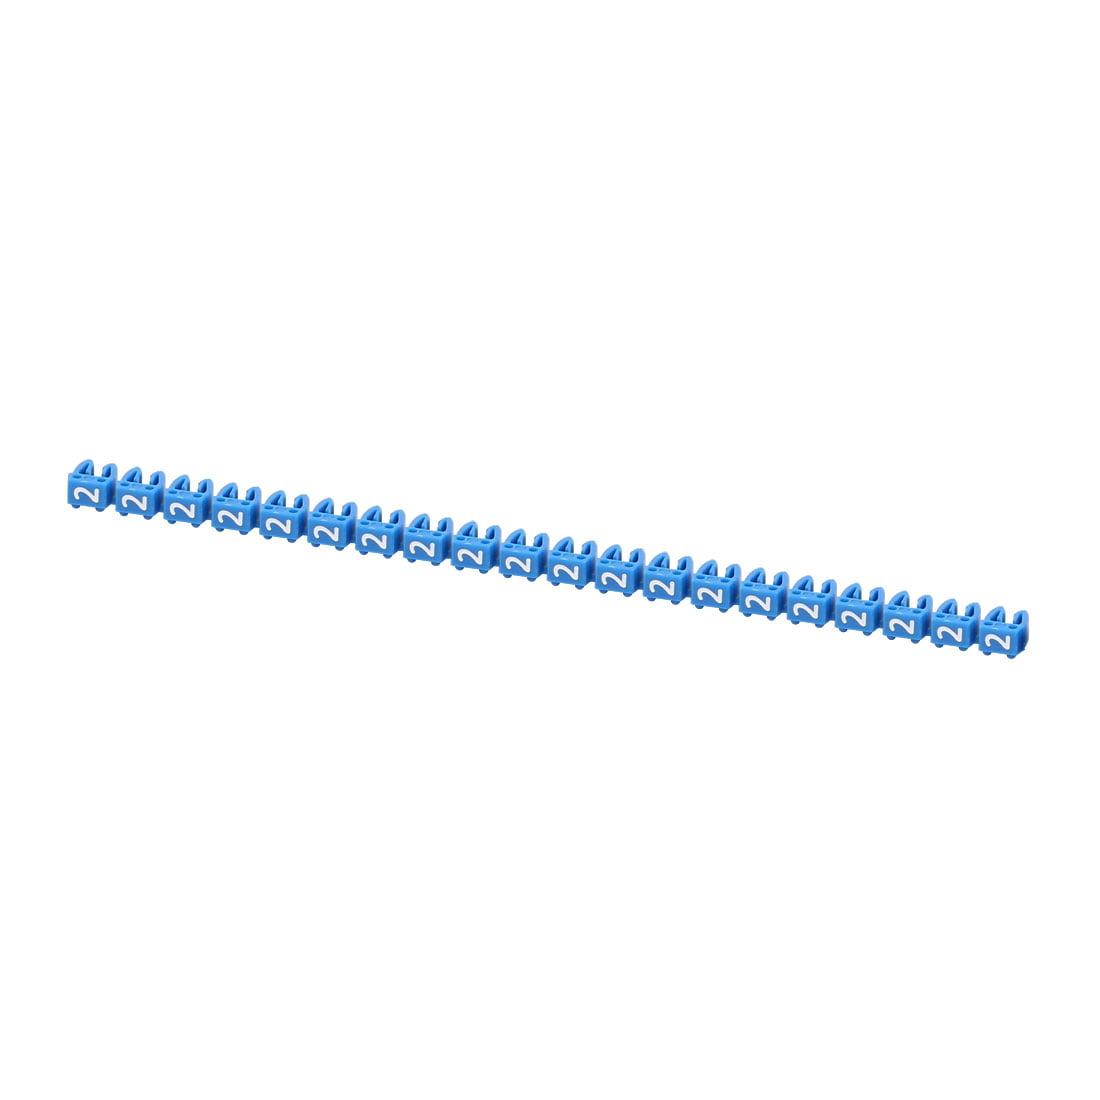 "20Pcs Letters ""2"" Network Cable Labels Markers Blue for 3.0-4.0mm Dia Wire - image 3 de 3"